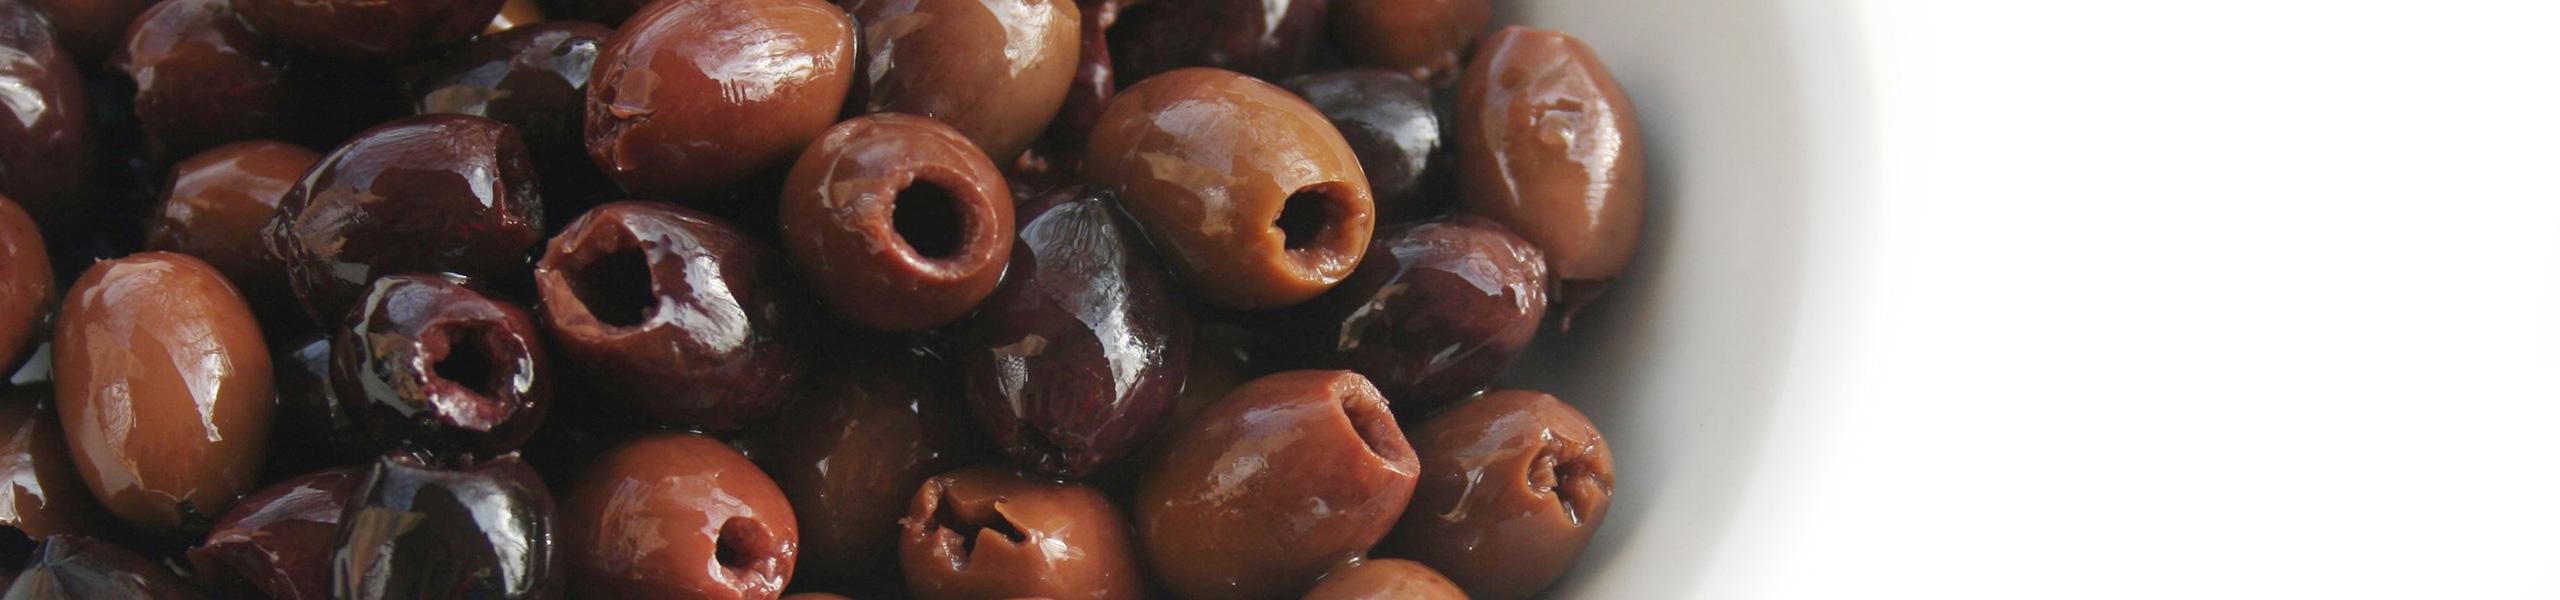 Olive Taggiasche in olio extra vergine di oliva